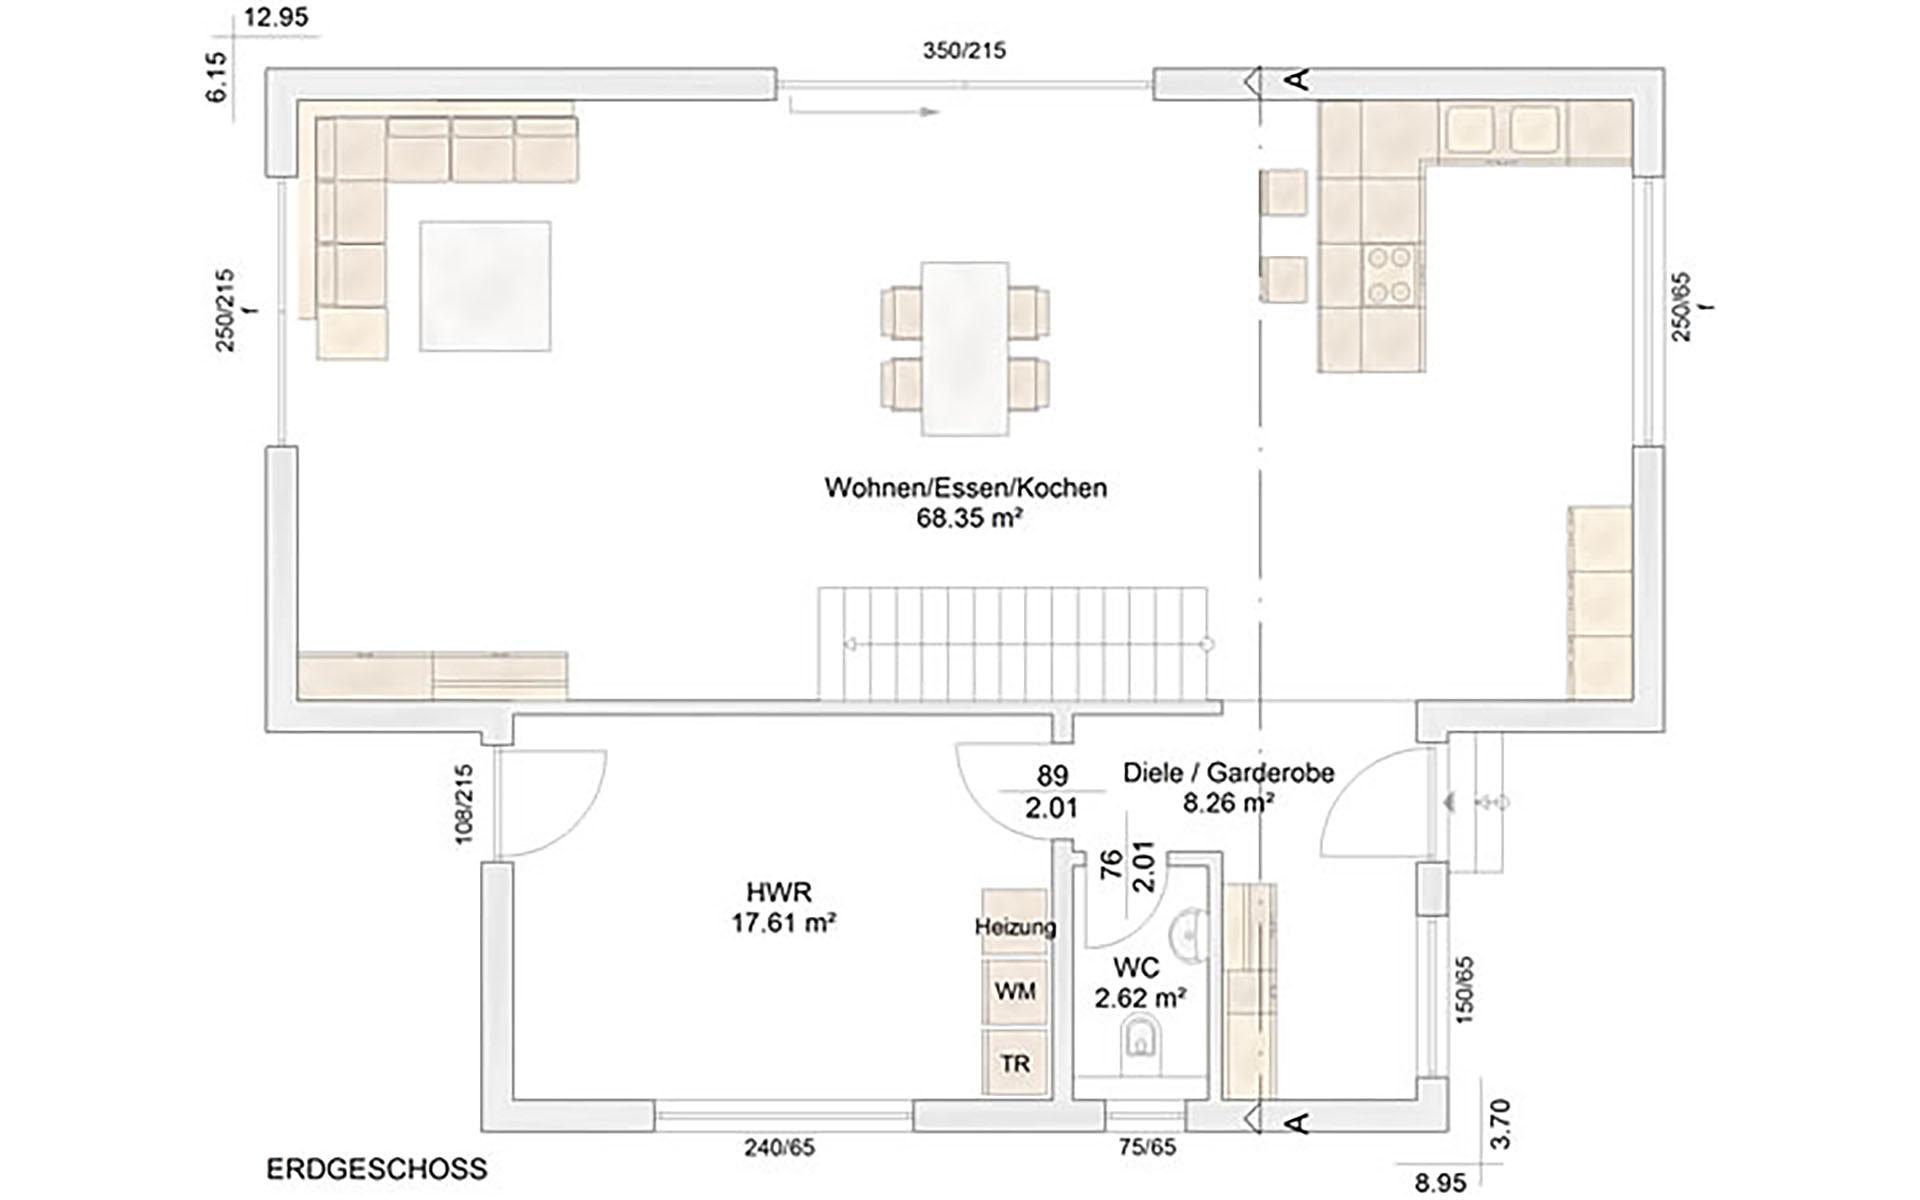 Erdgeschoss Garitz von Albert-Haus GmbH & Co. KG